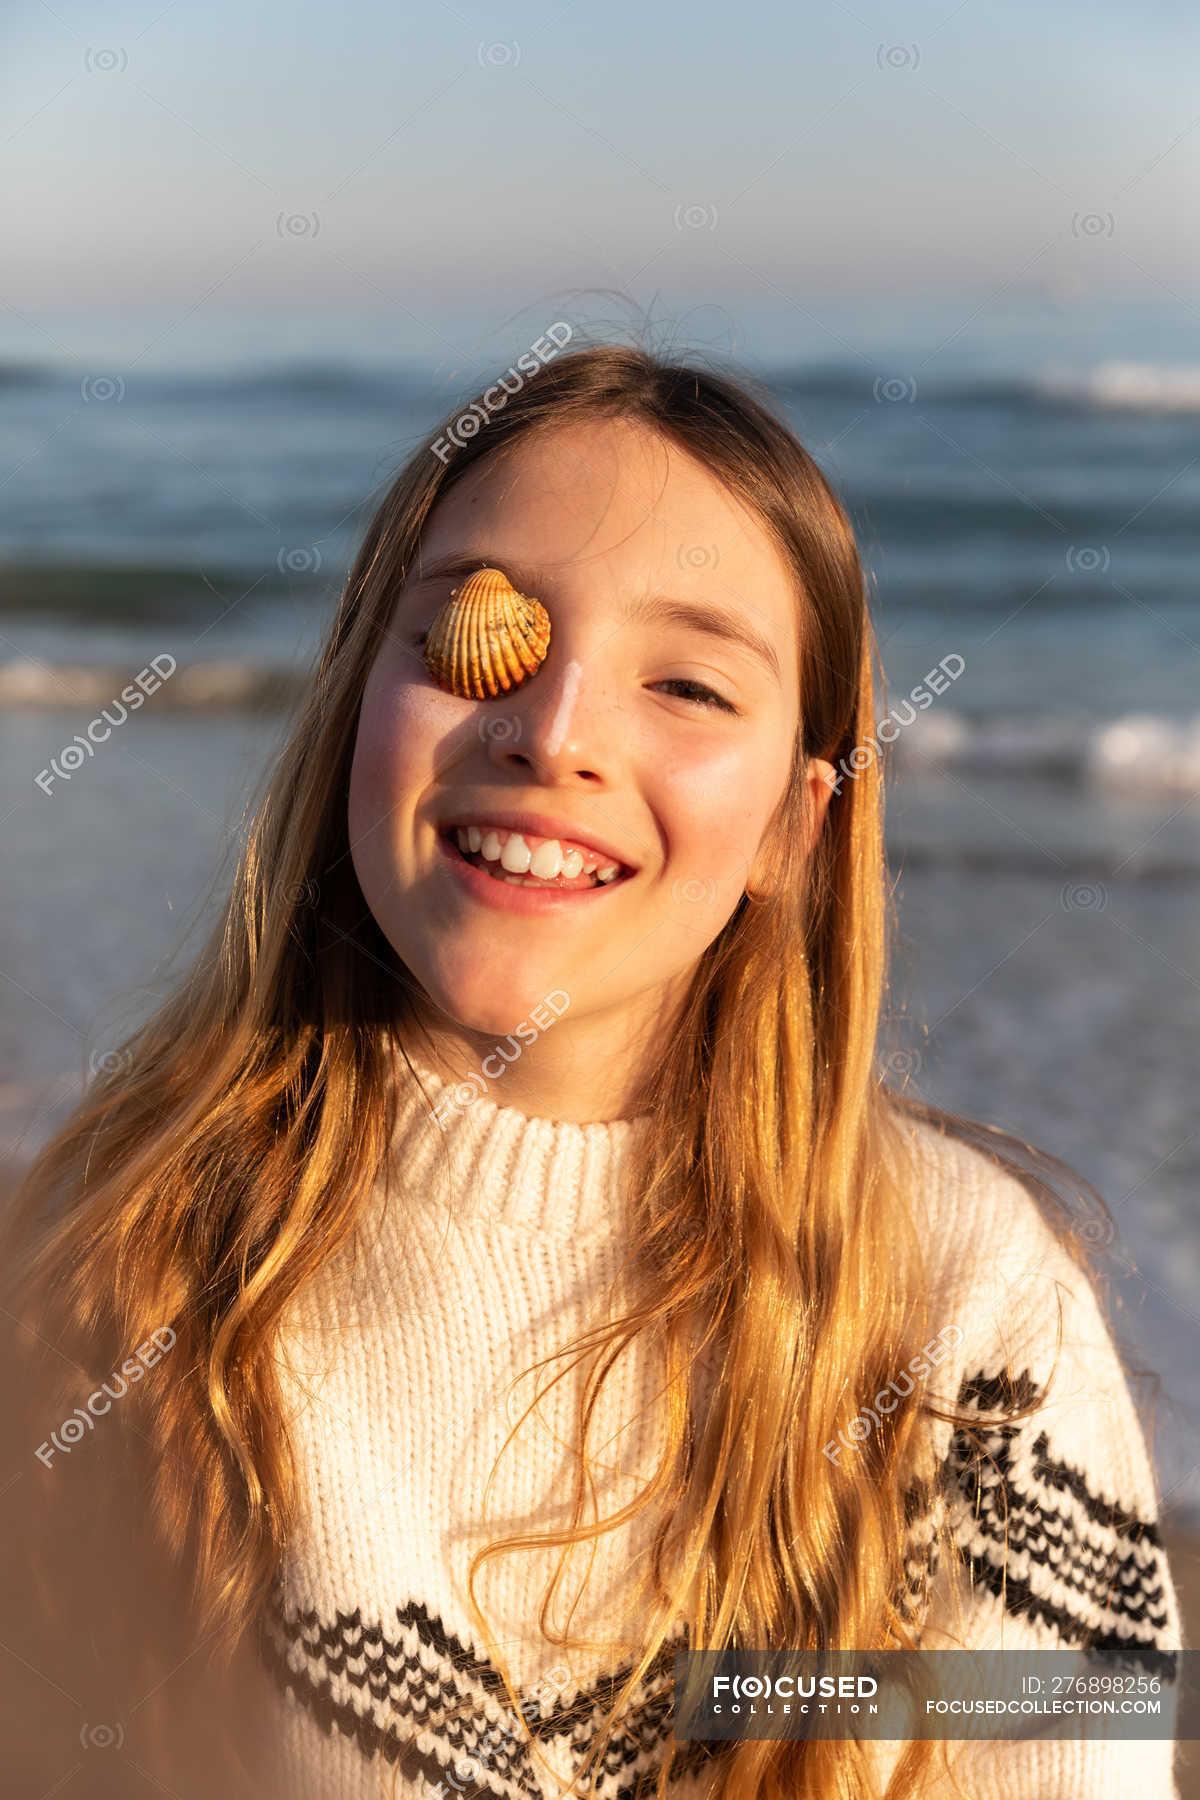 اجمل صور بنات 2020 اجمل صور بنات اطفال خلفيات بنات صغيره جميلة جدا 34